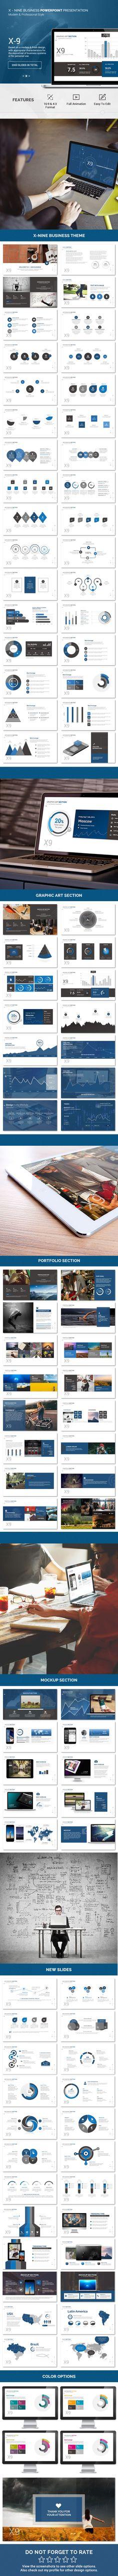 PowerPoint Template #design #slides Download: http://graphicriver.net/item/x9-version-2/13619340?ref=ksioks